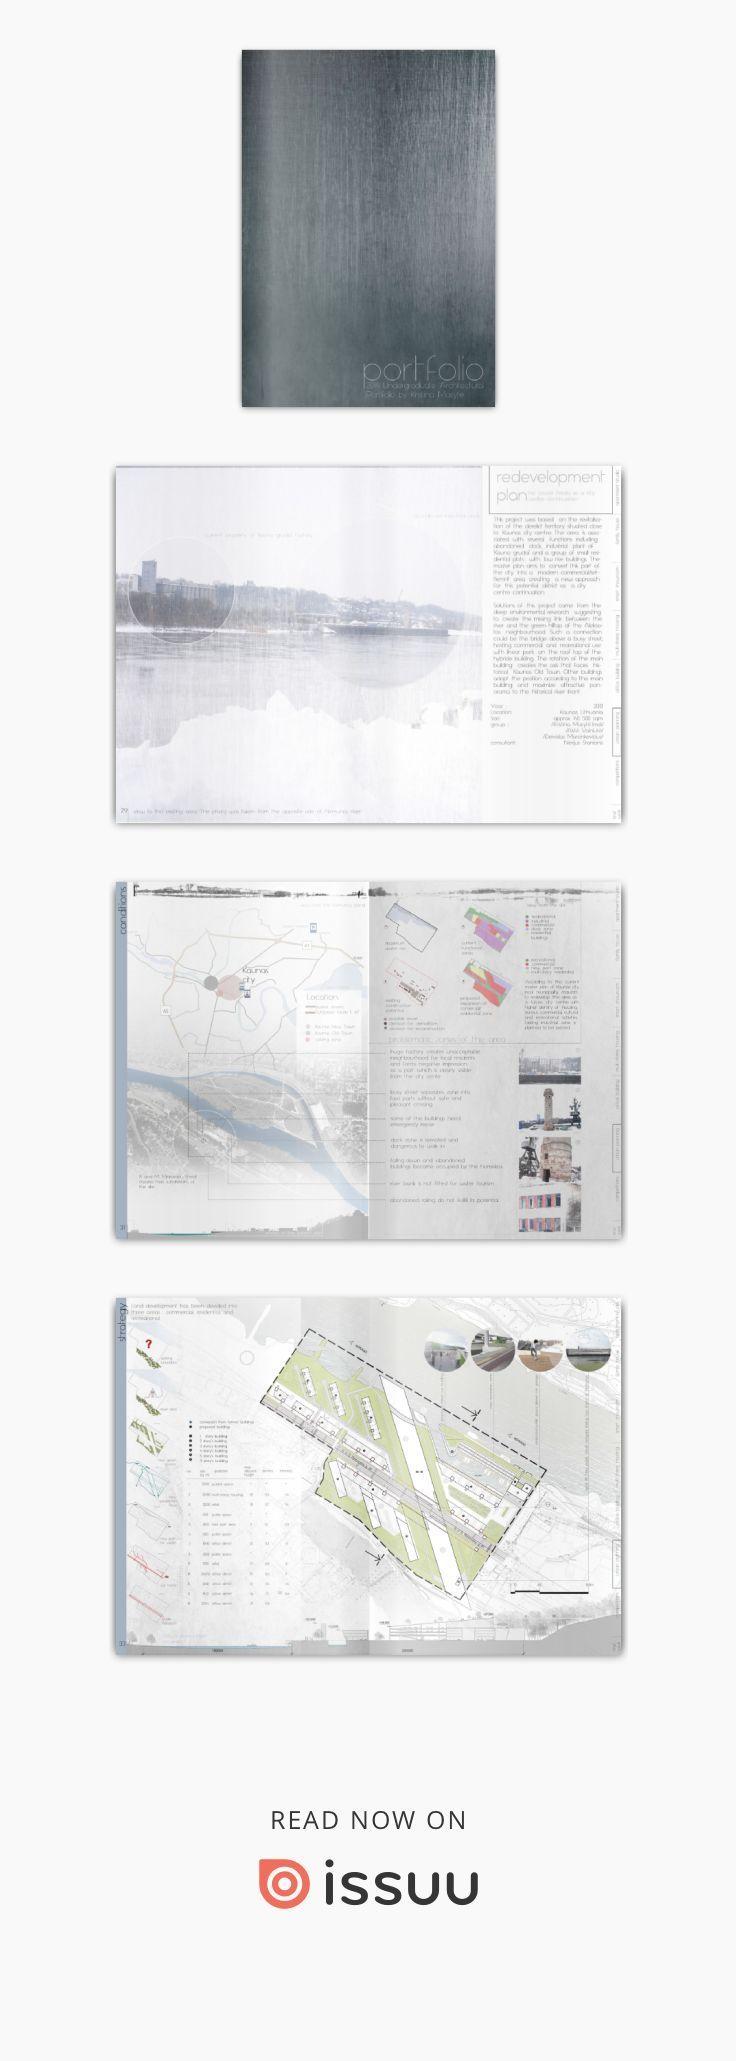 2014 Undergraduate Architectural Portfolio by Kristina